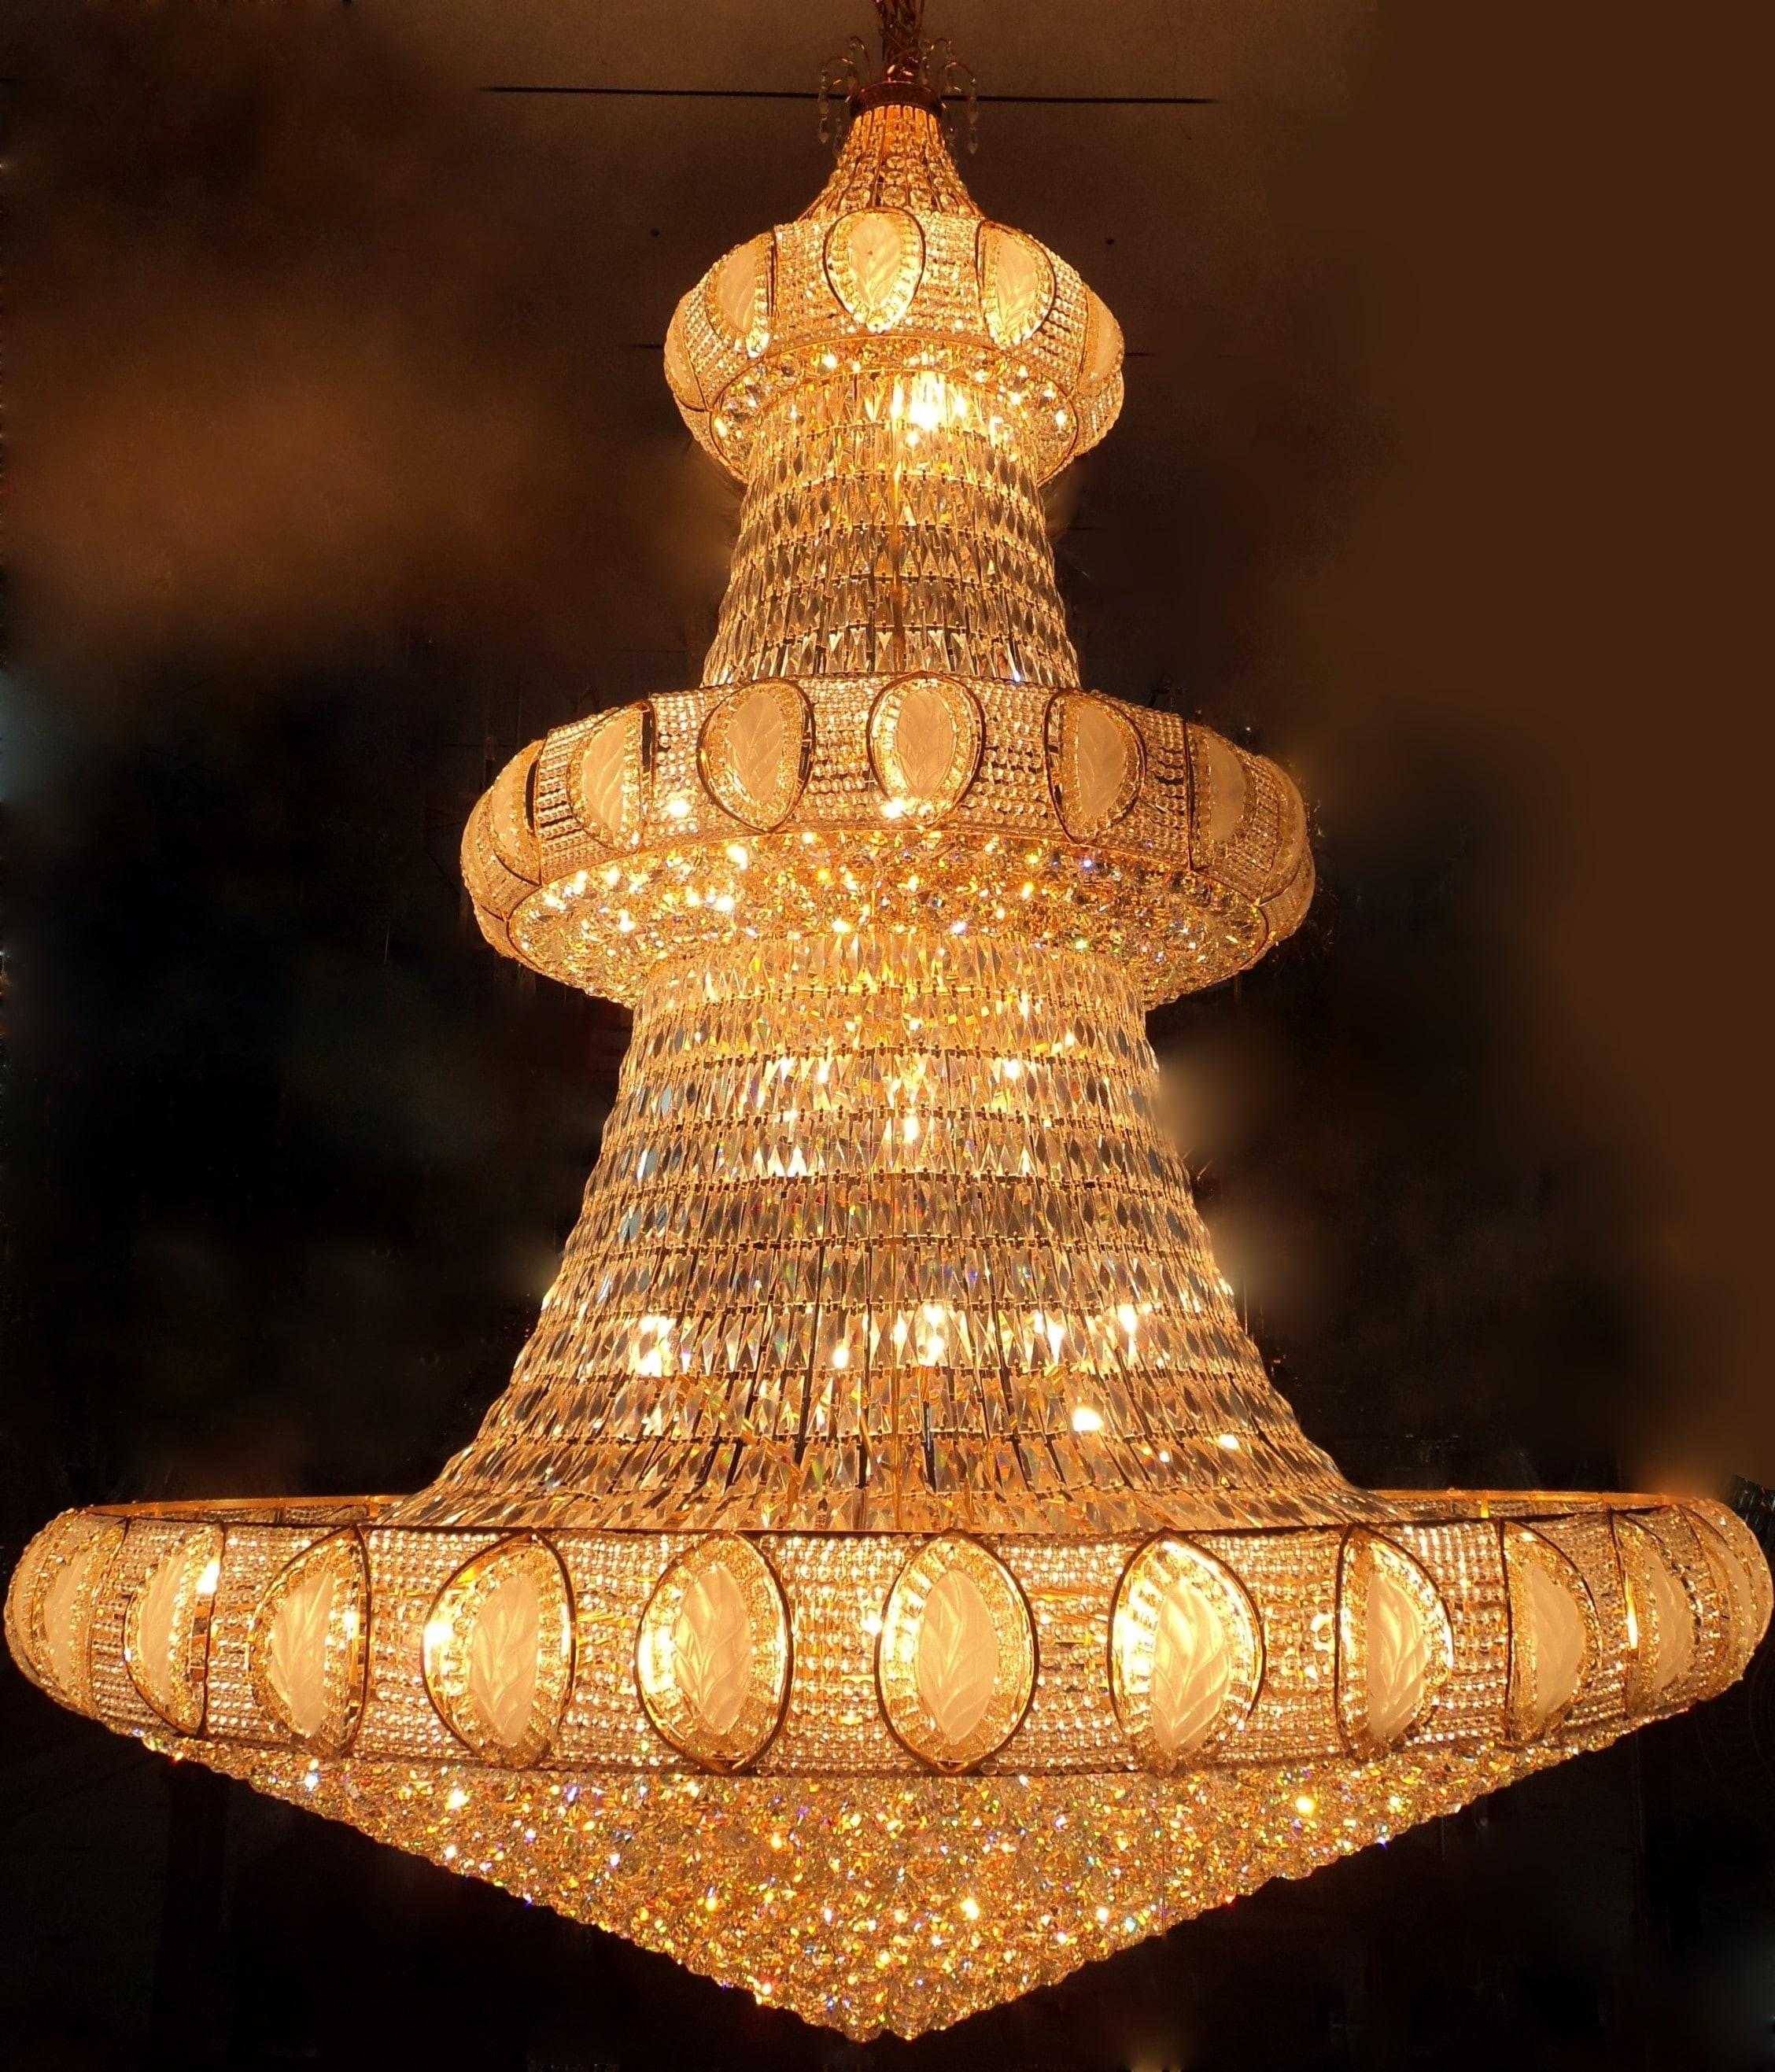 Crystal Chandelier Small Size: Large Crystal Golden Chandelier For Sale